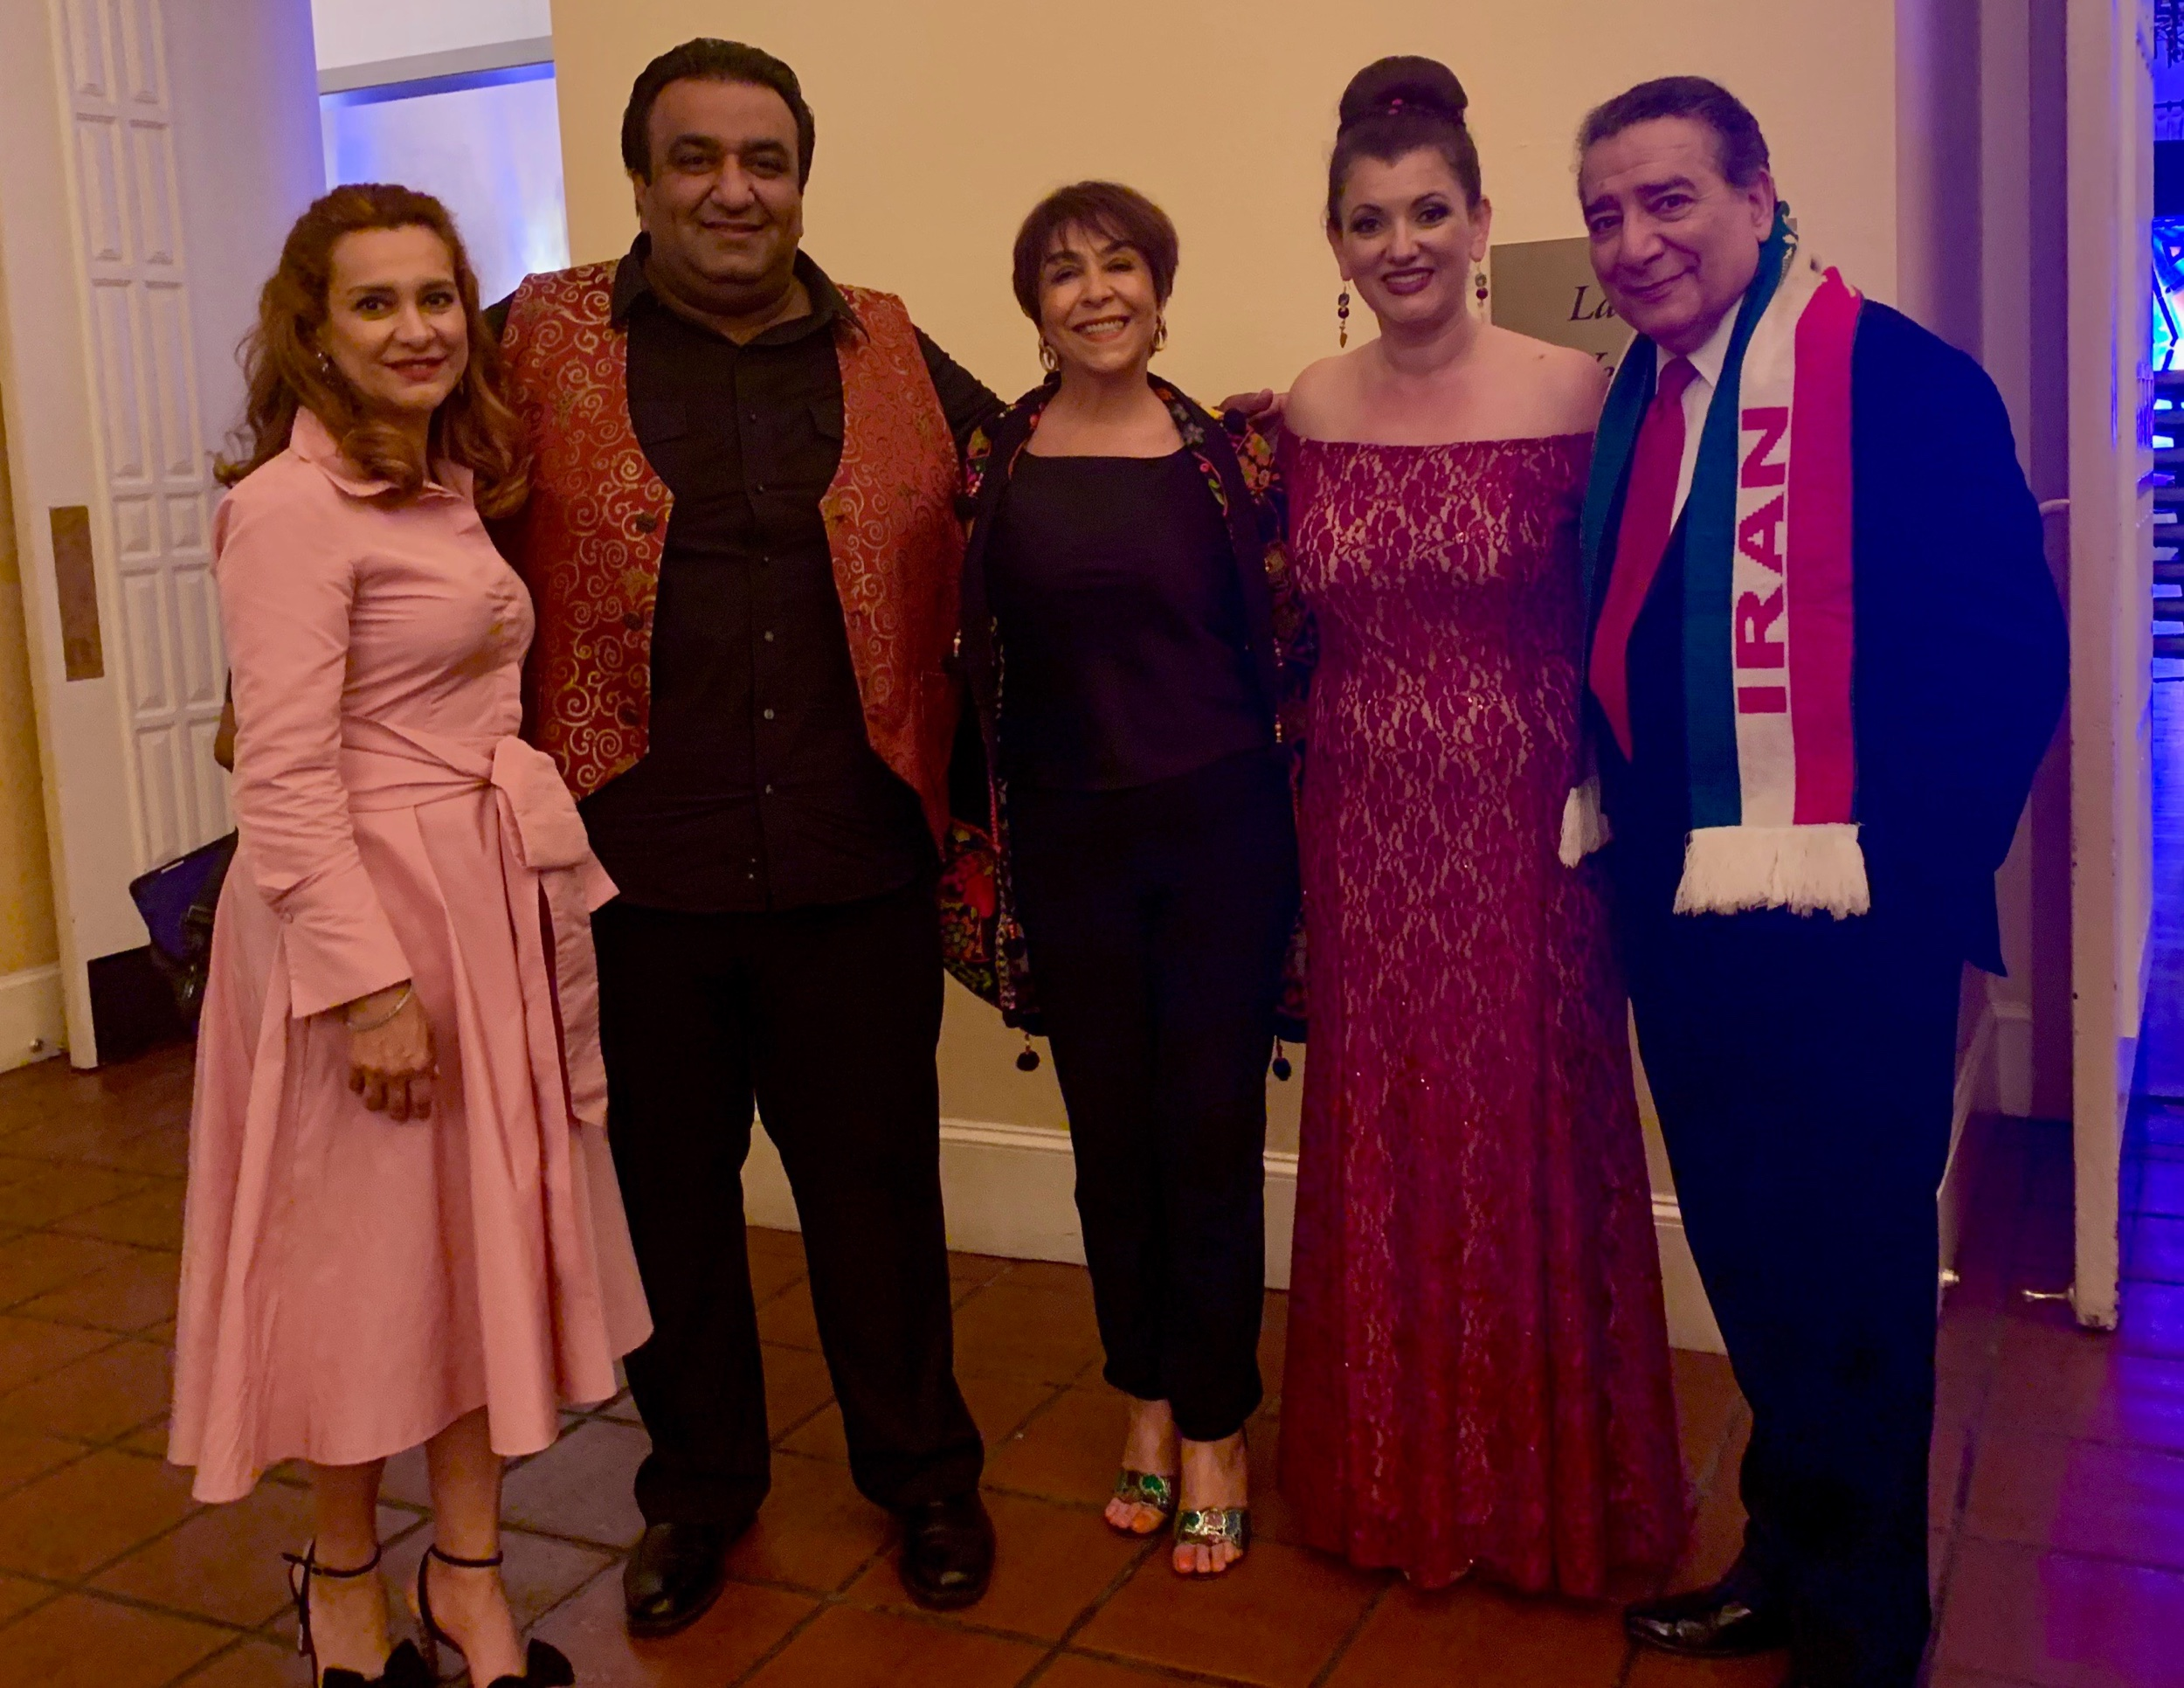 With amazing artists from left to right: Faranak Shahroozi, Shahin Yousefzamani, Ziba Shirazi, Niosha Nafei-Jamali, and Ardavan Mofid at Castlewood Country Club.